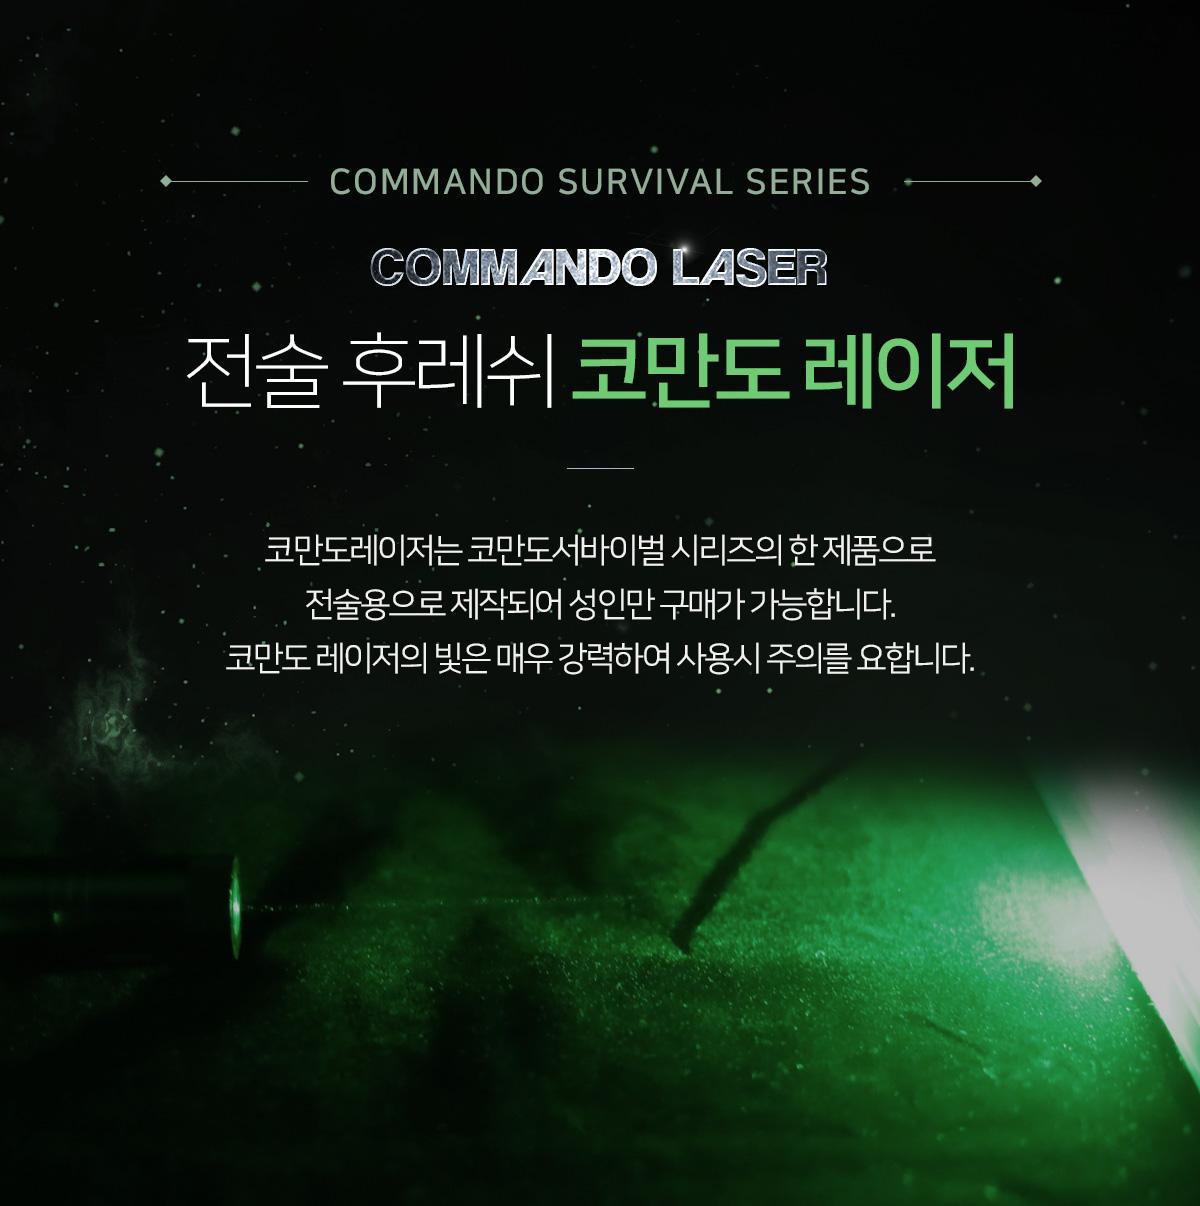 laser_new1.jpg